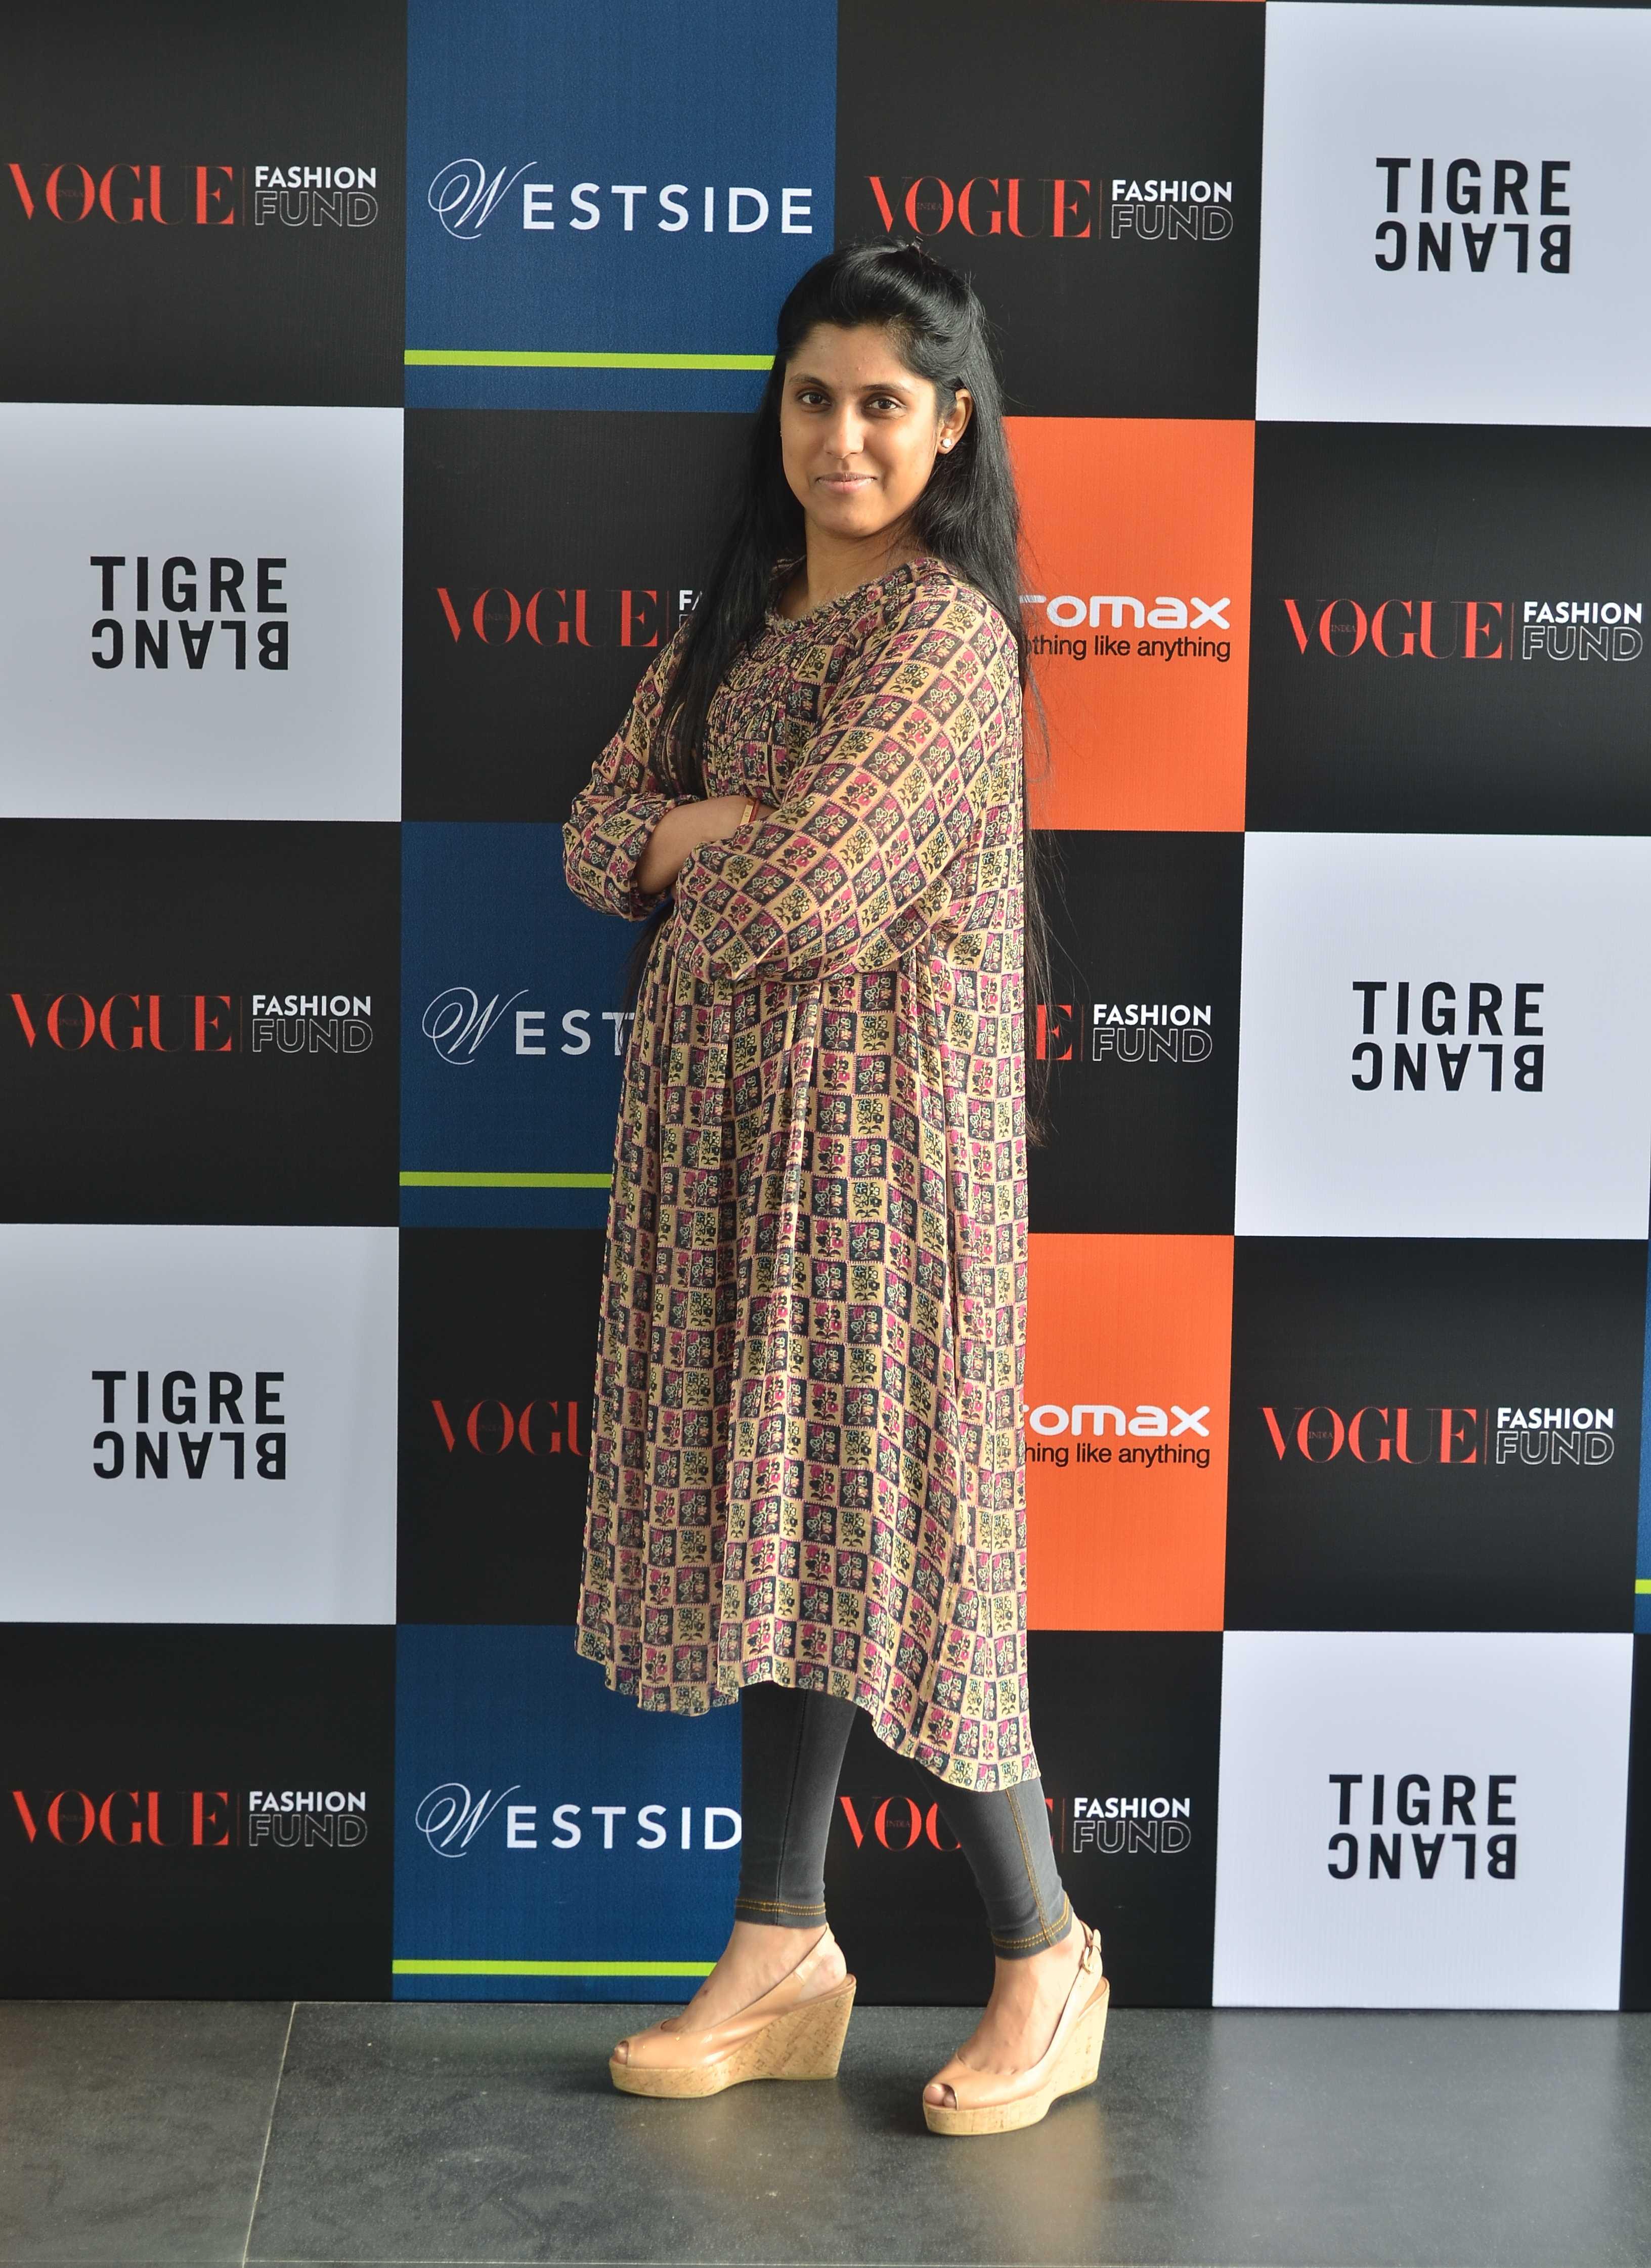 Vogue Fashion Fund semi-finalist Tanvi Kedia